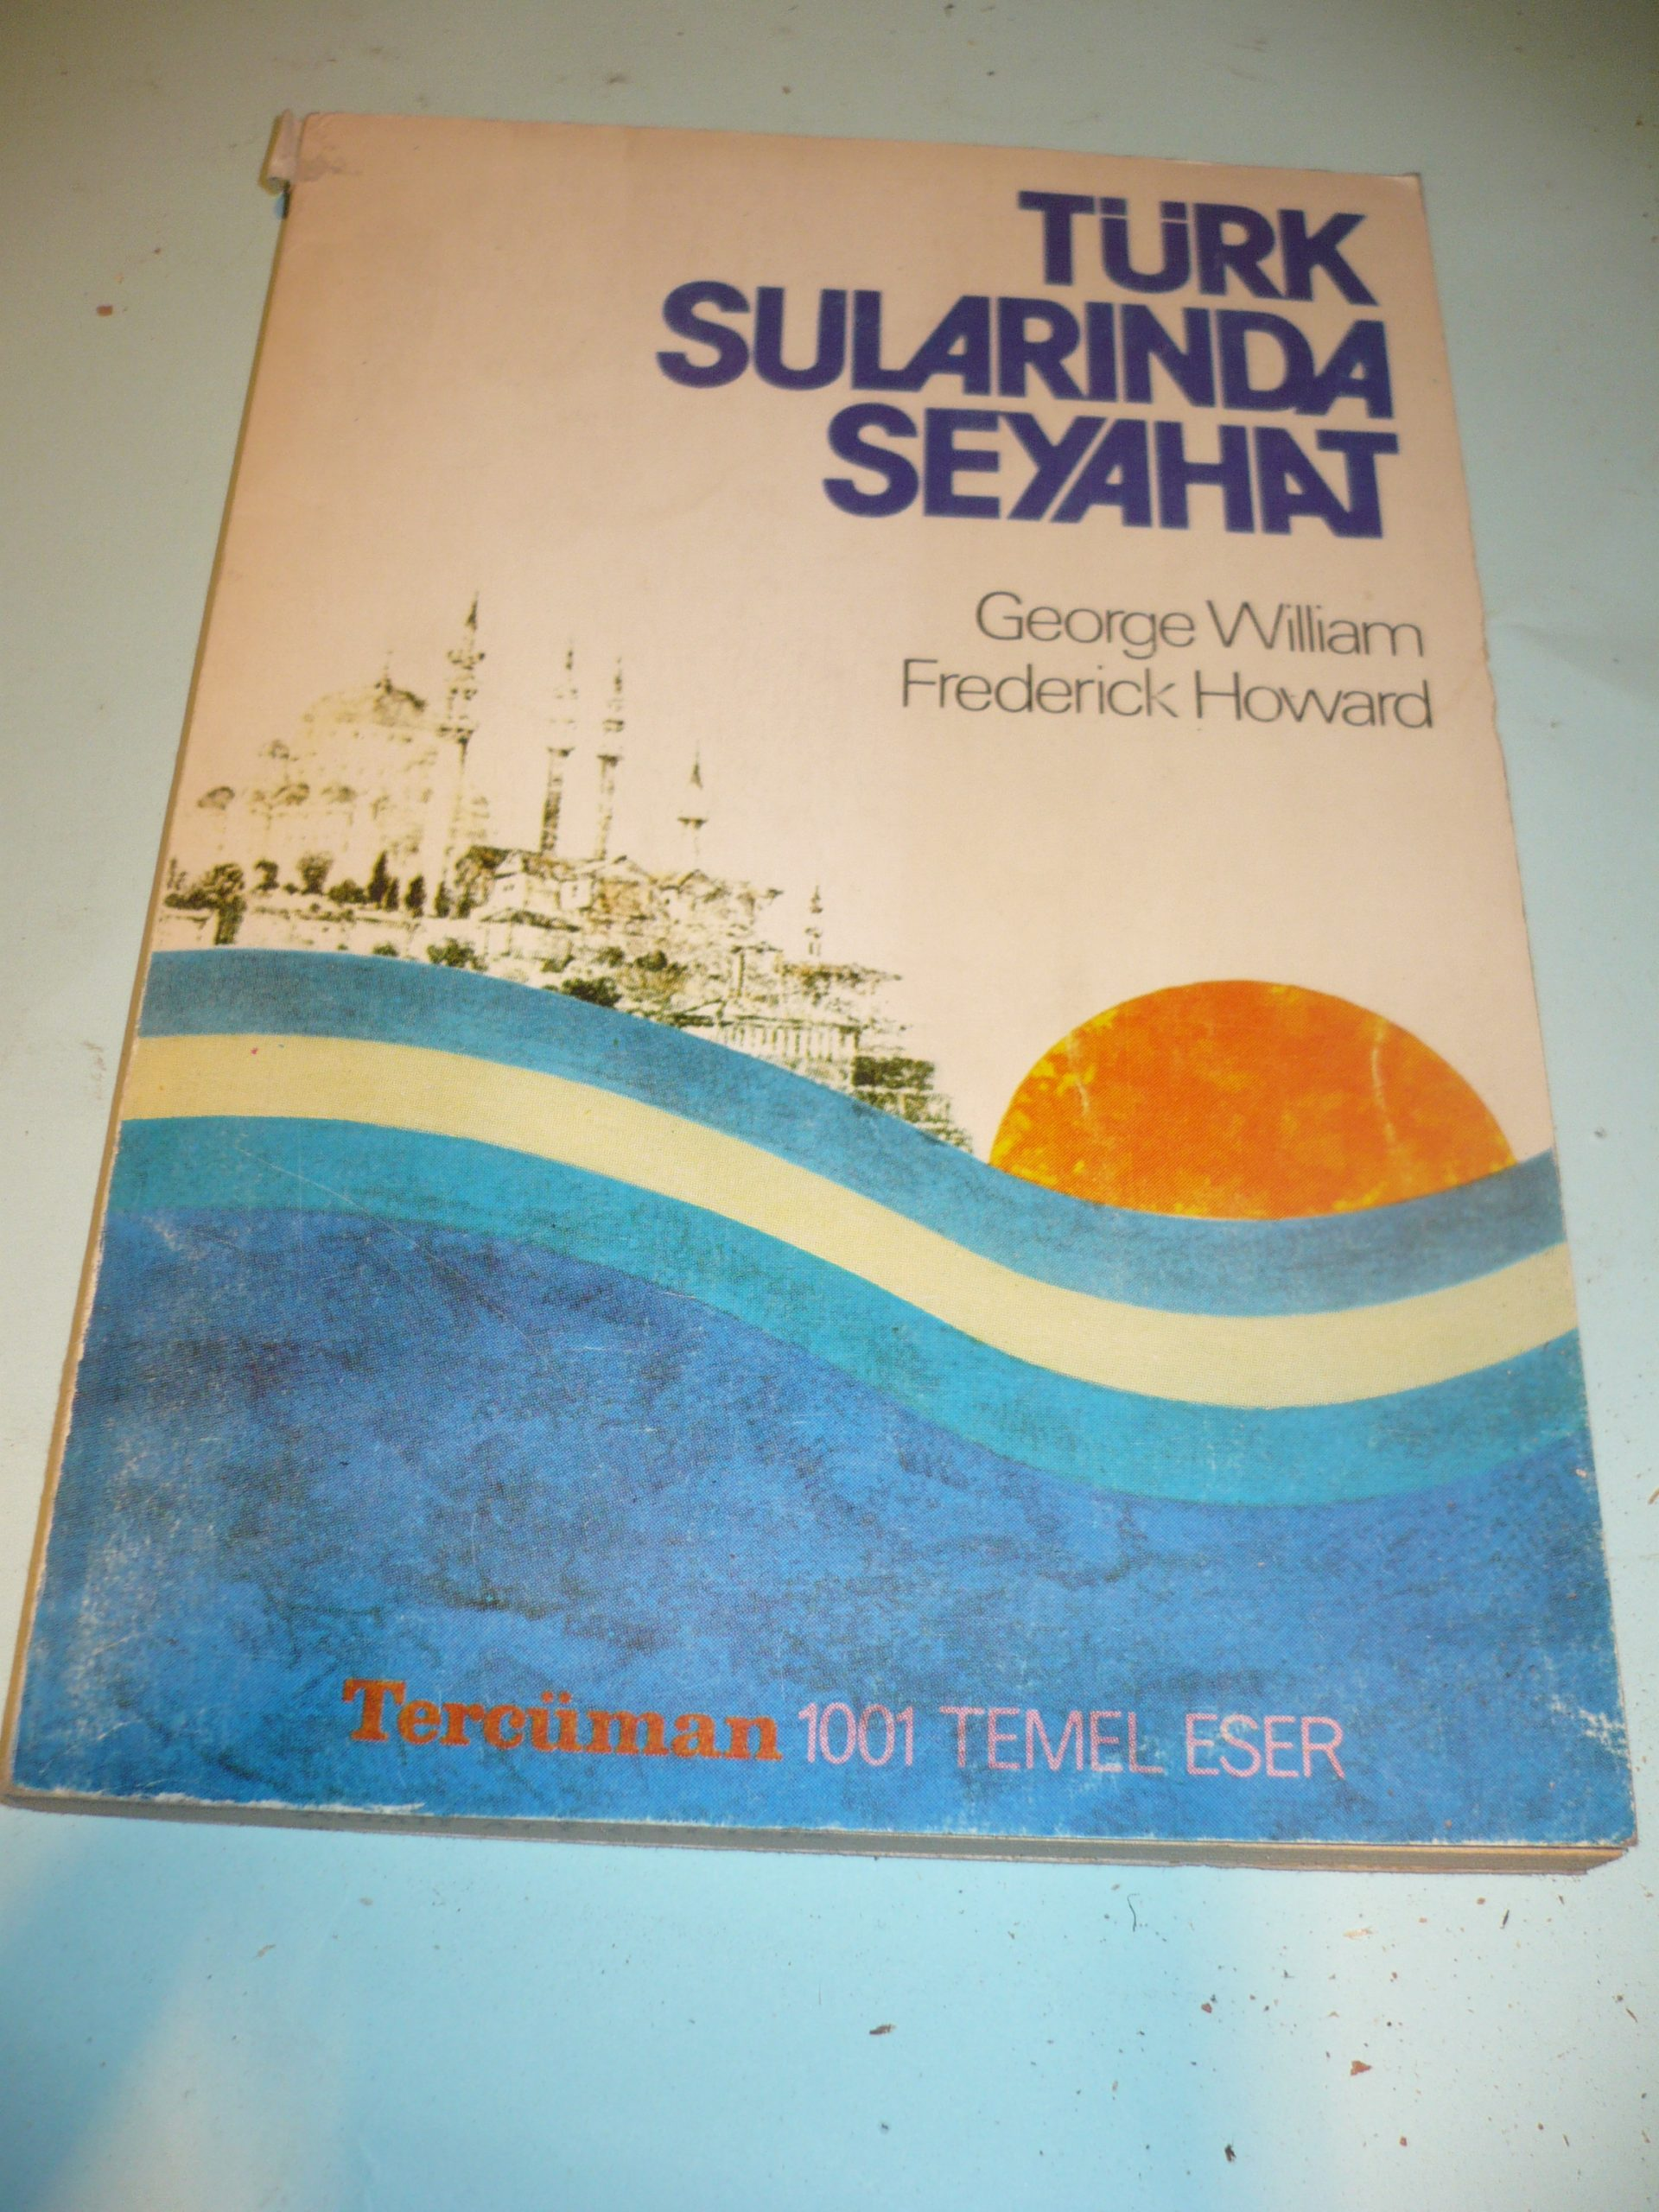 TÜRK SULARINDA SEYAHAT/G.W.FREDERICH HOWARD